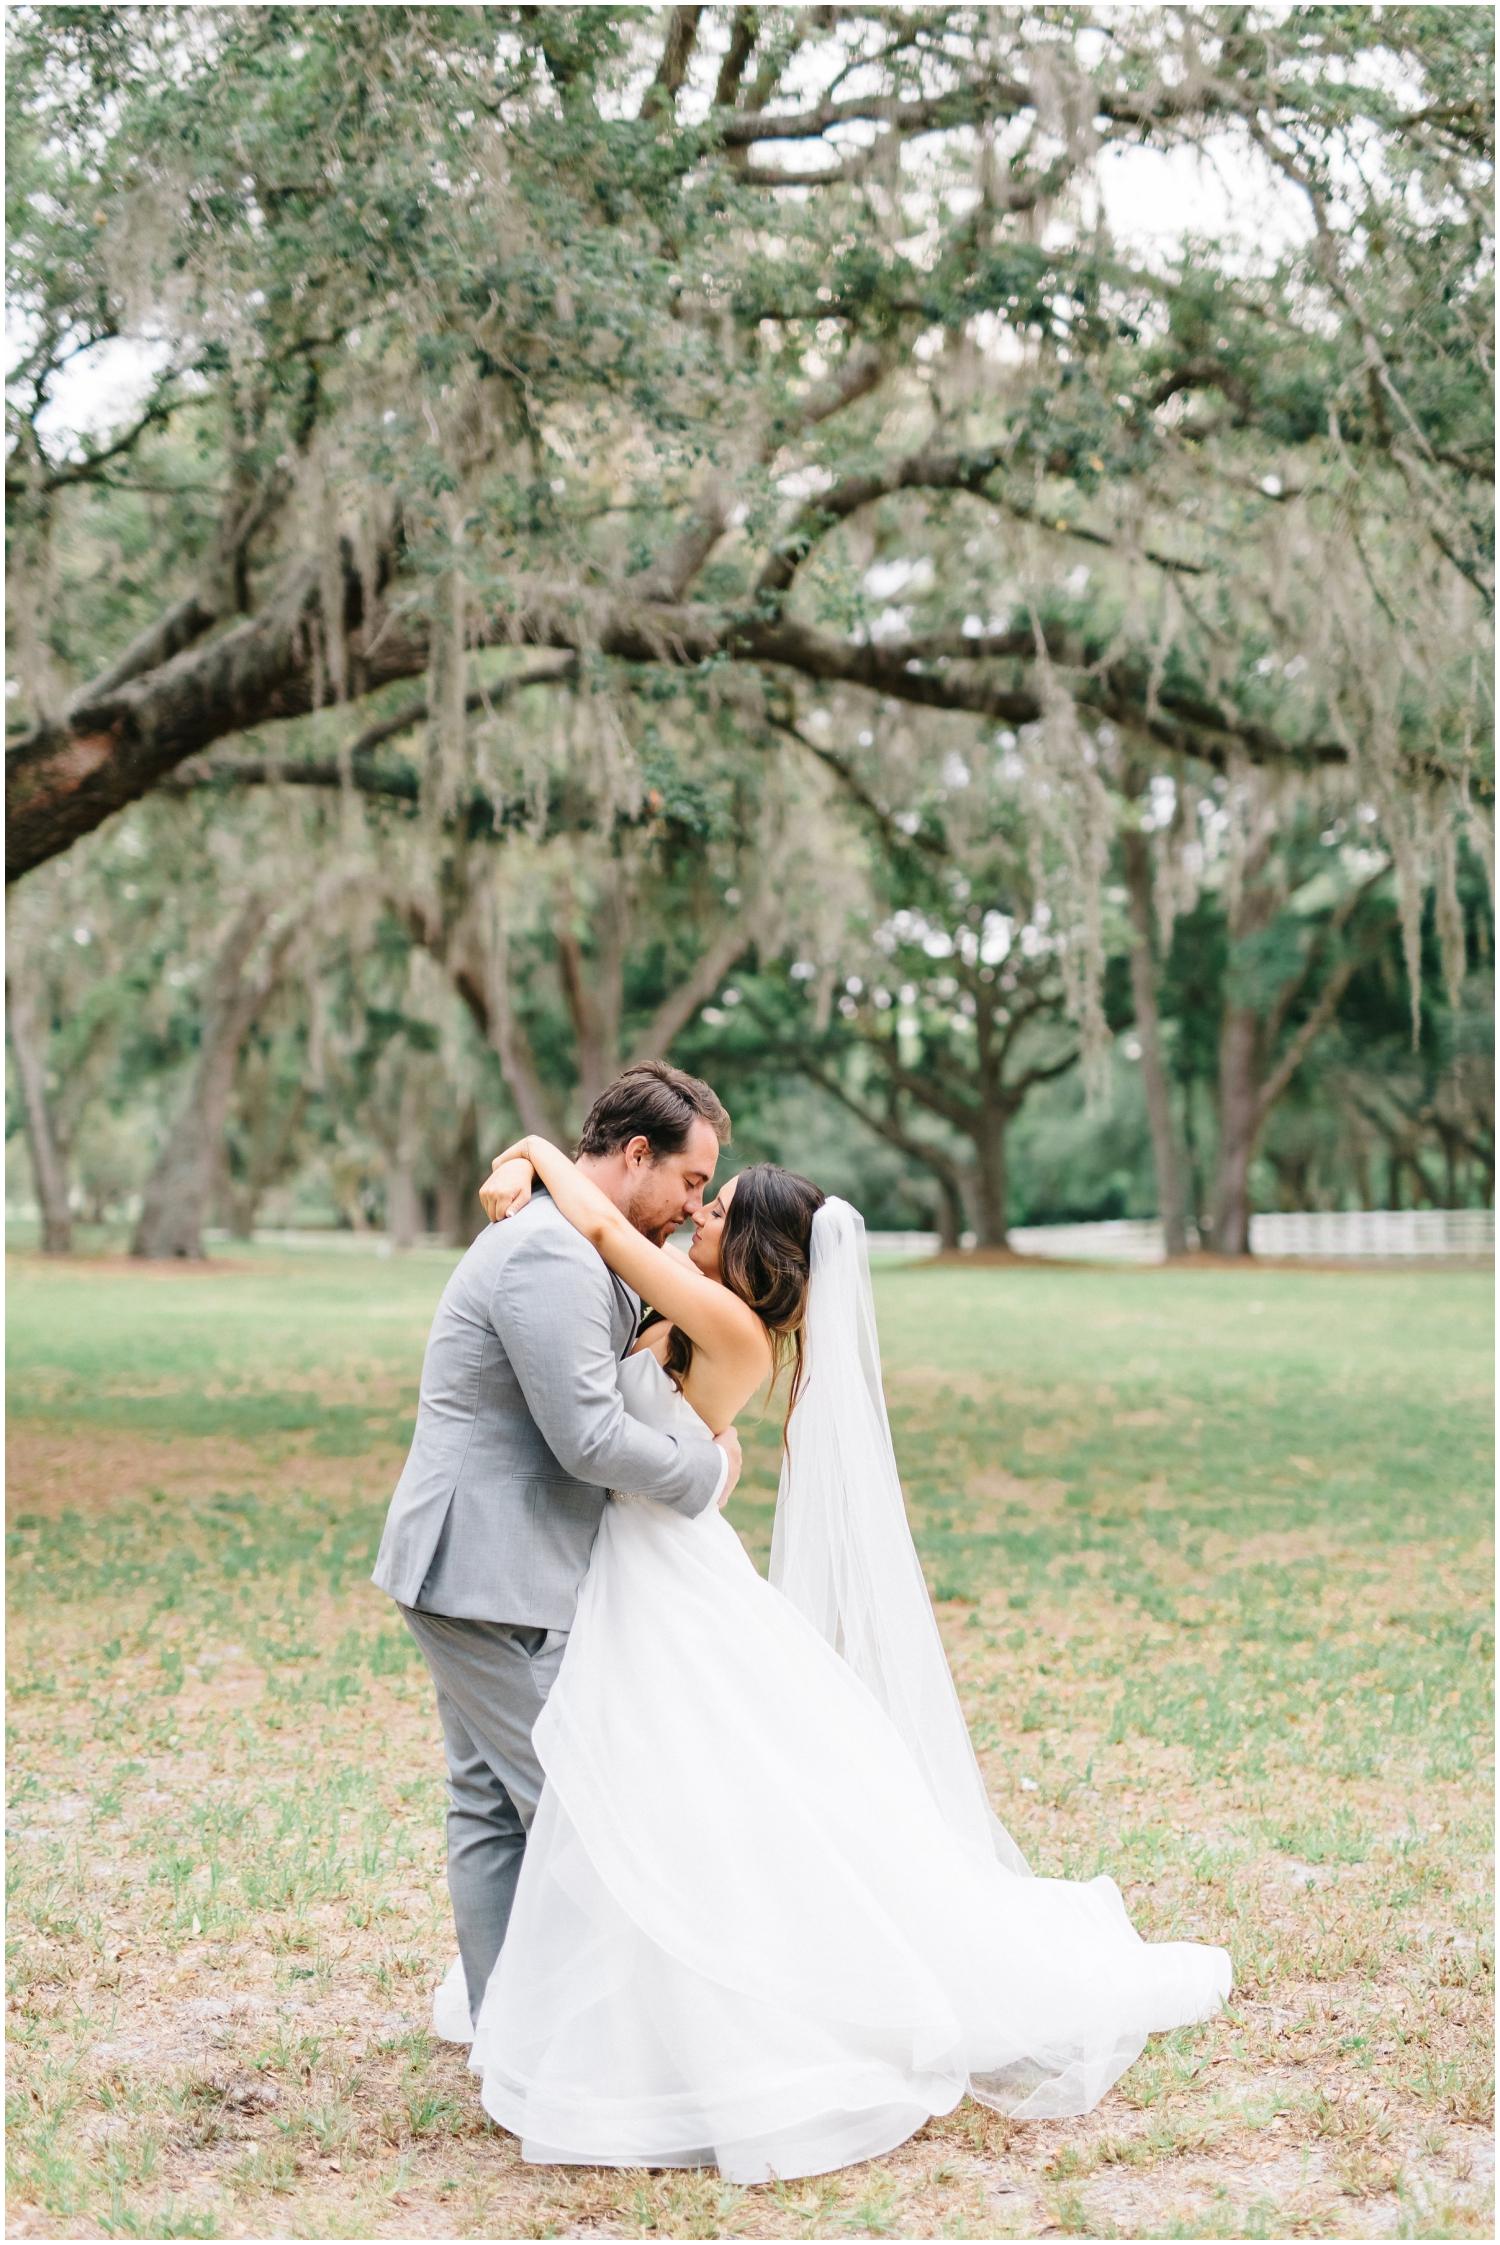 Bride and groom kiss at their Florida wedding